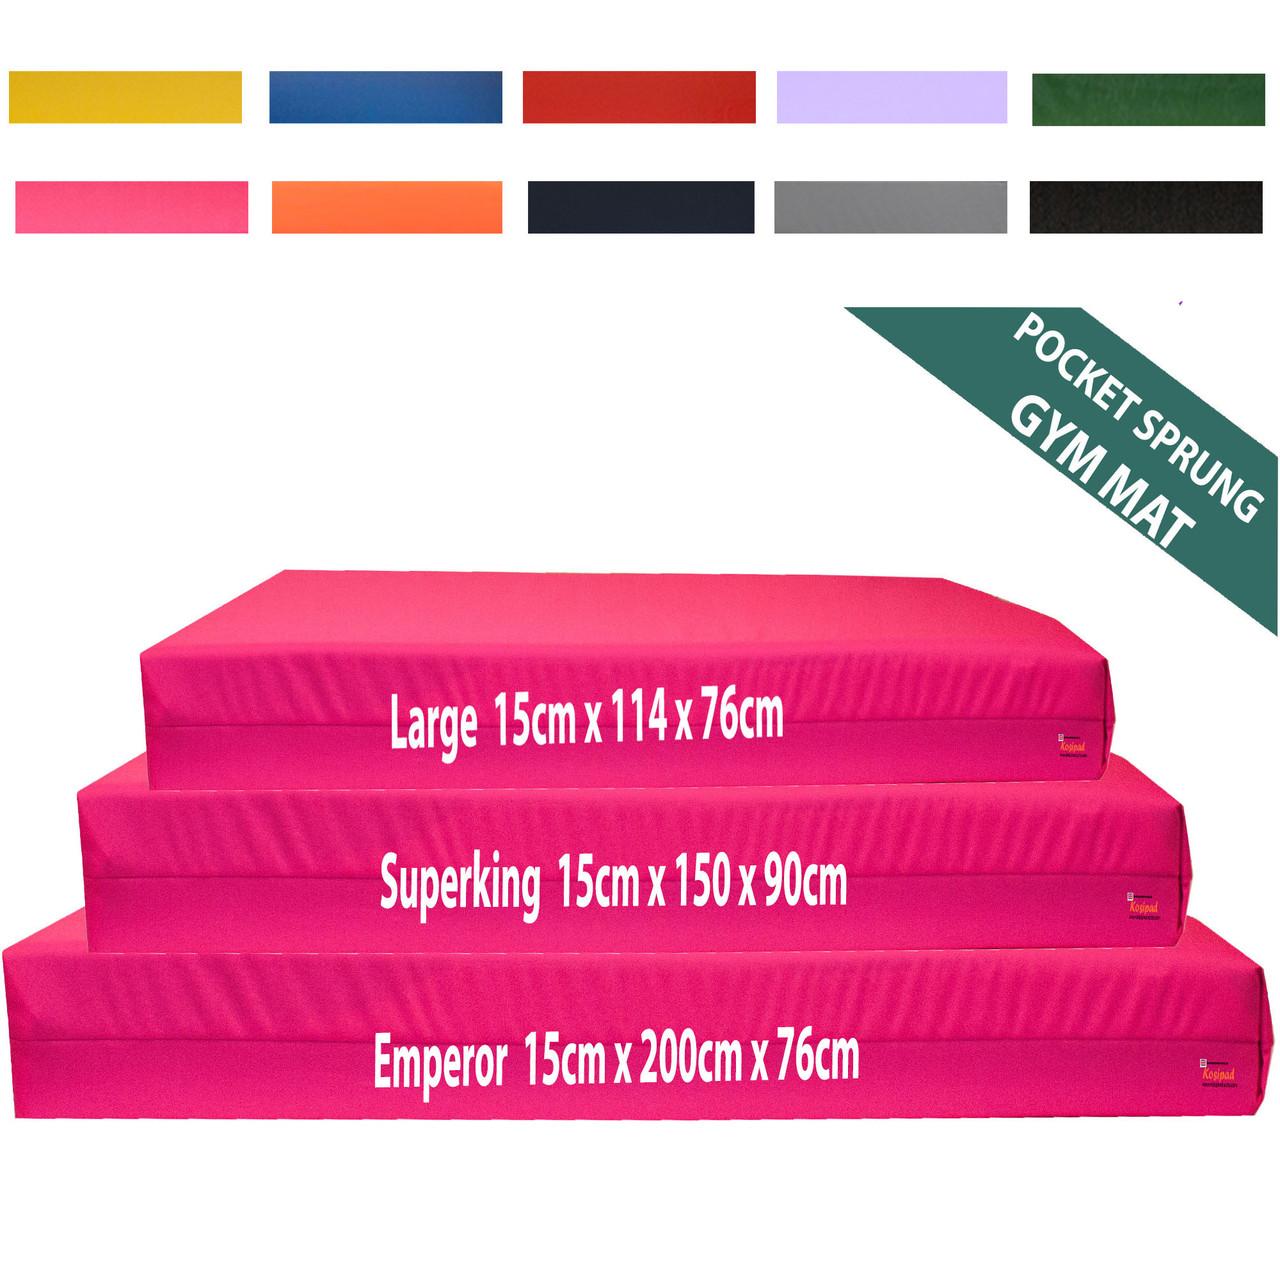 Kosipad 15cm Pocket Sprung gymnastics crash mat Pink